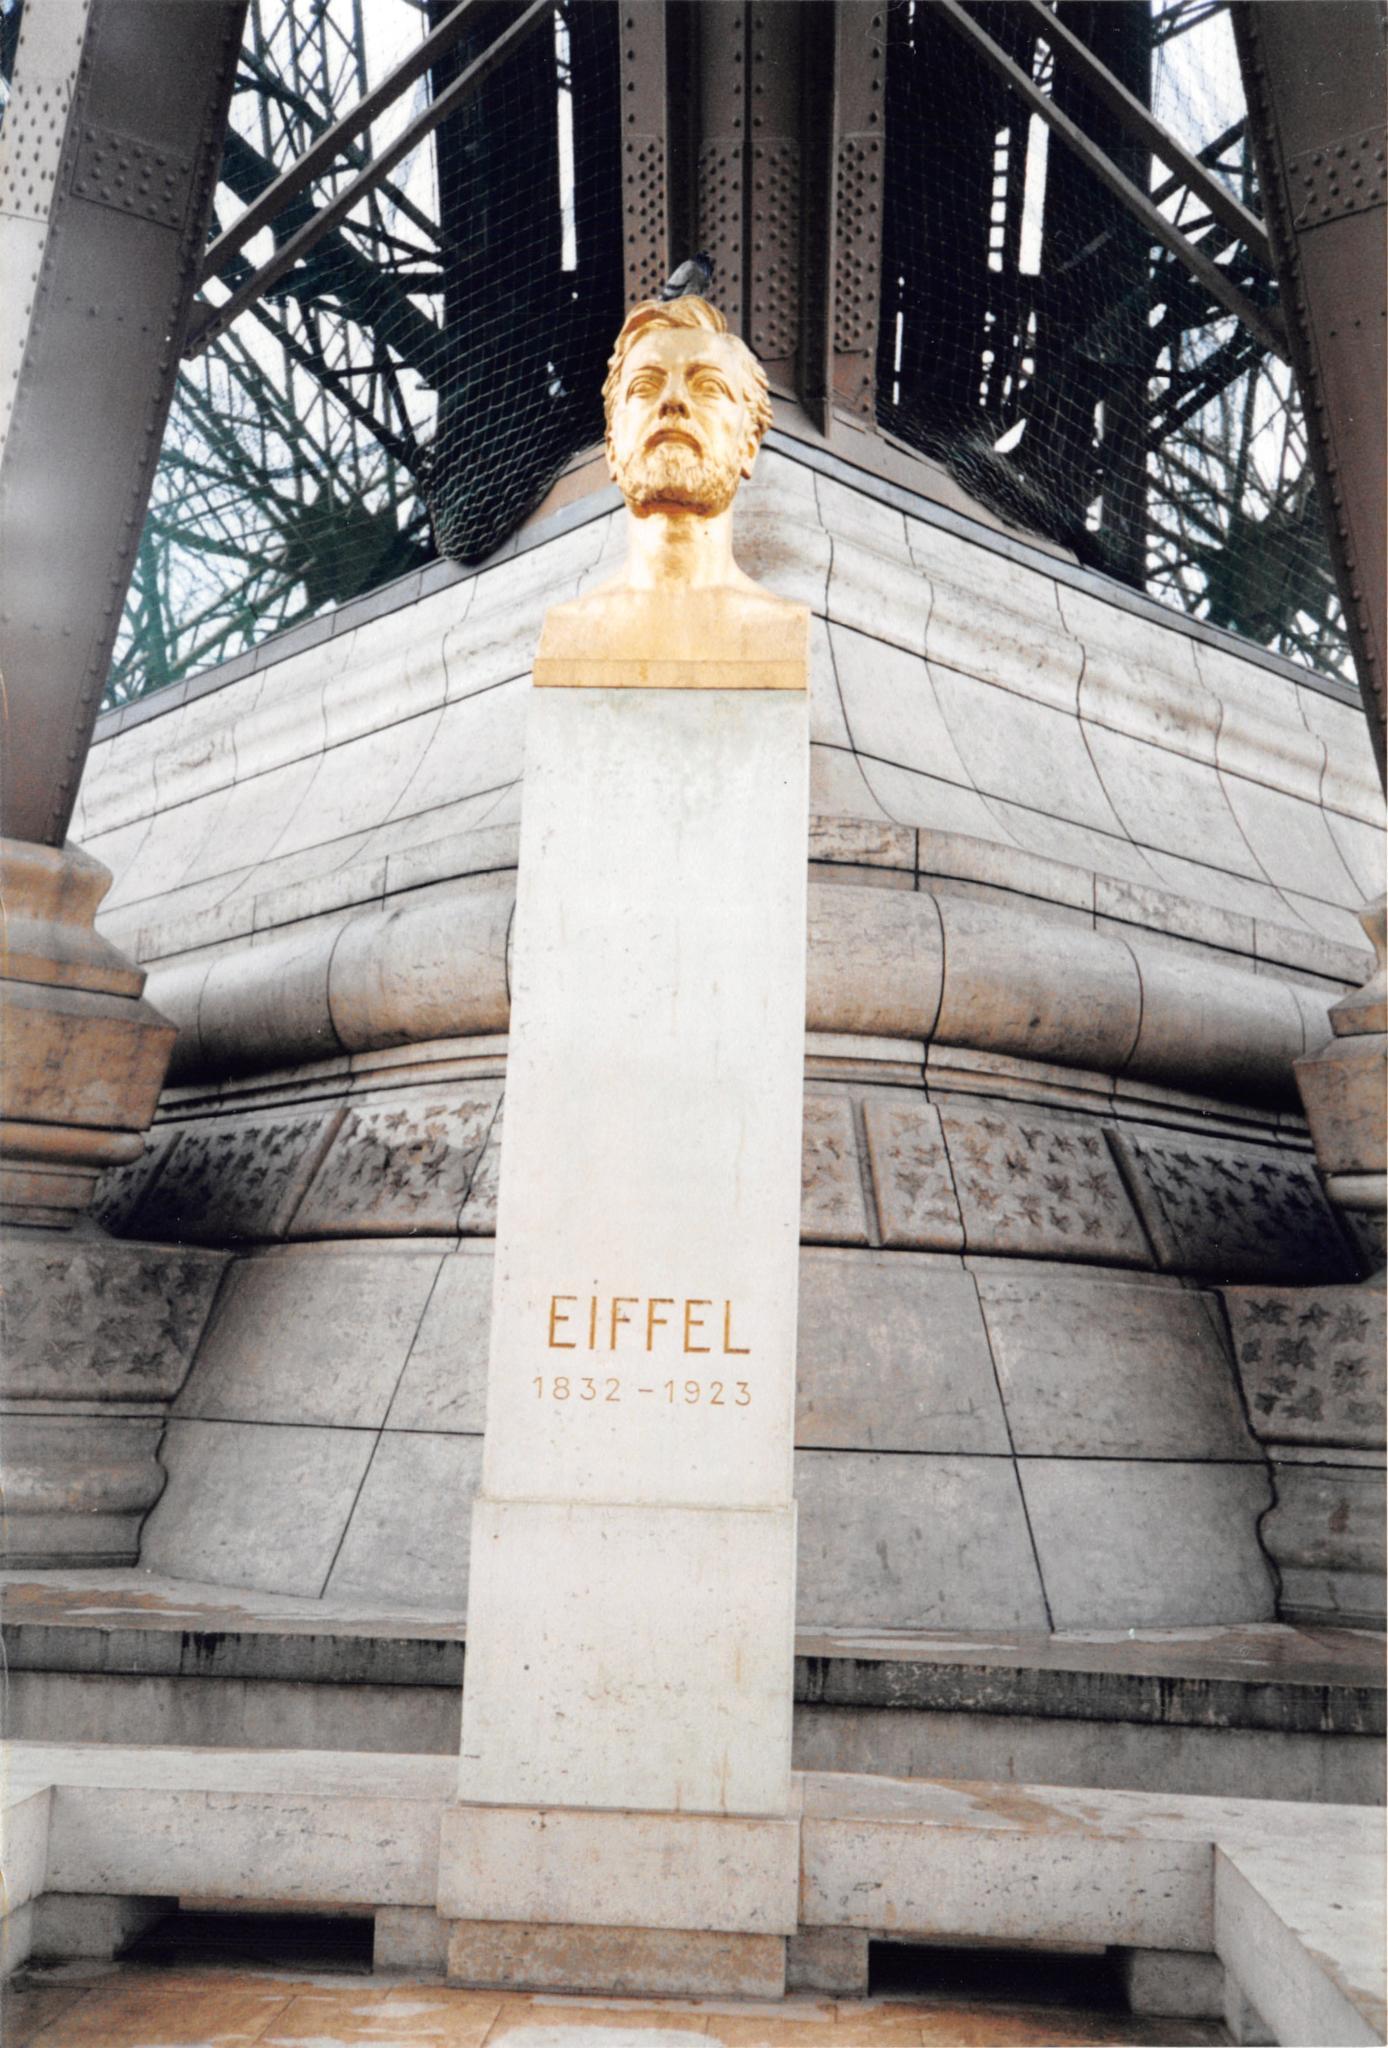 Eiffel Monument by John Schneyer